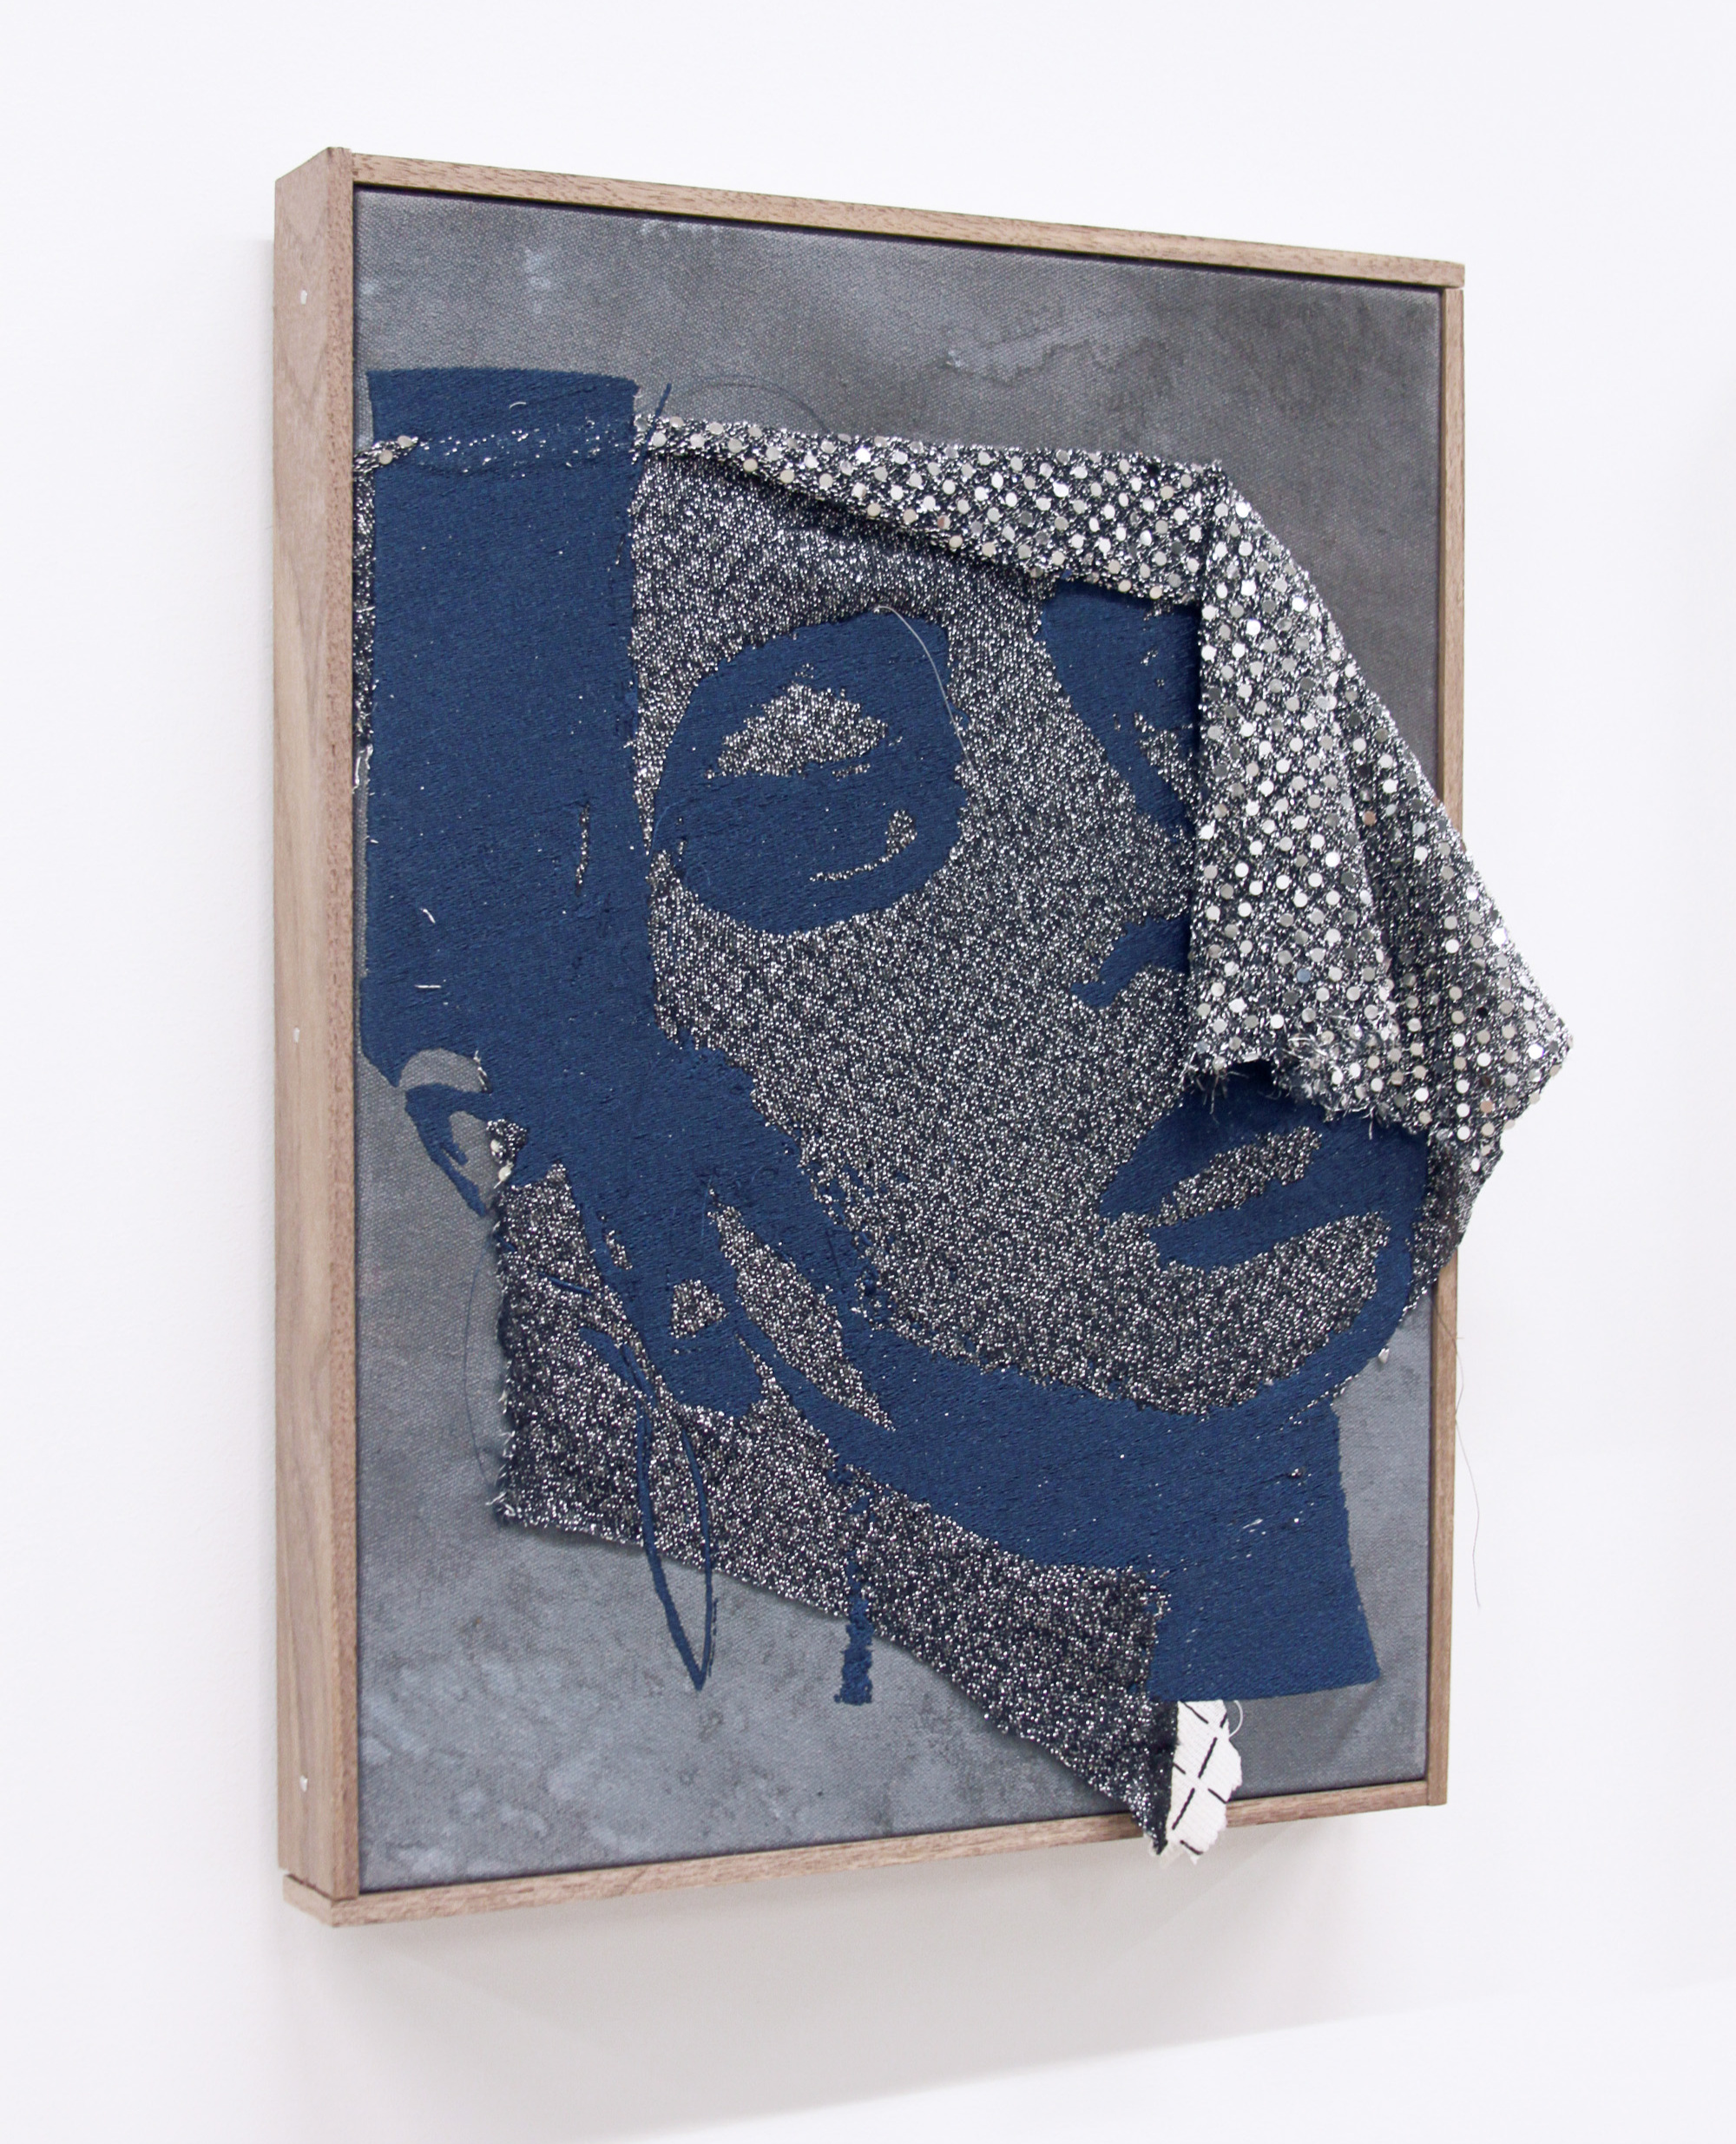 BRENDAN FOWLER   Danielle , 2016, Embroidery on found fabric, acrylic, canvas, artist frame